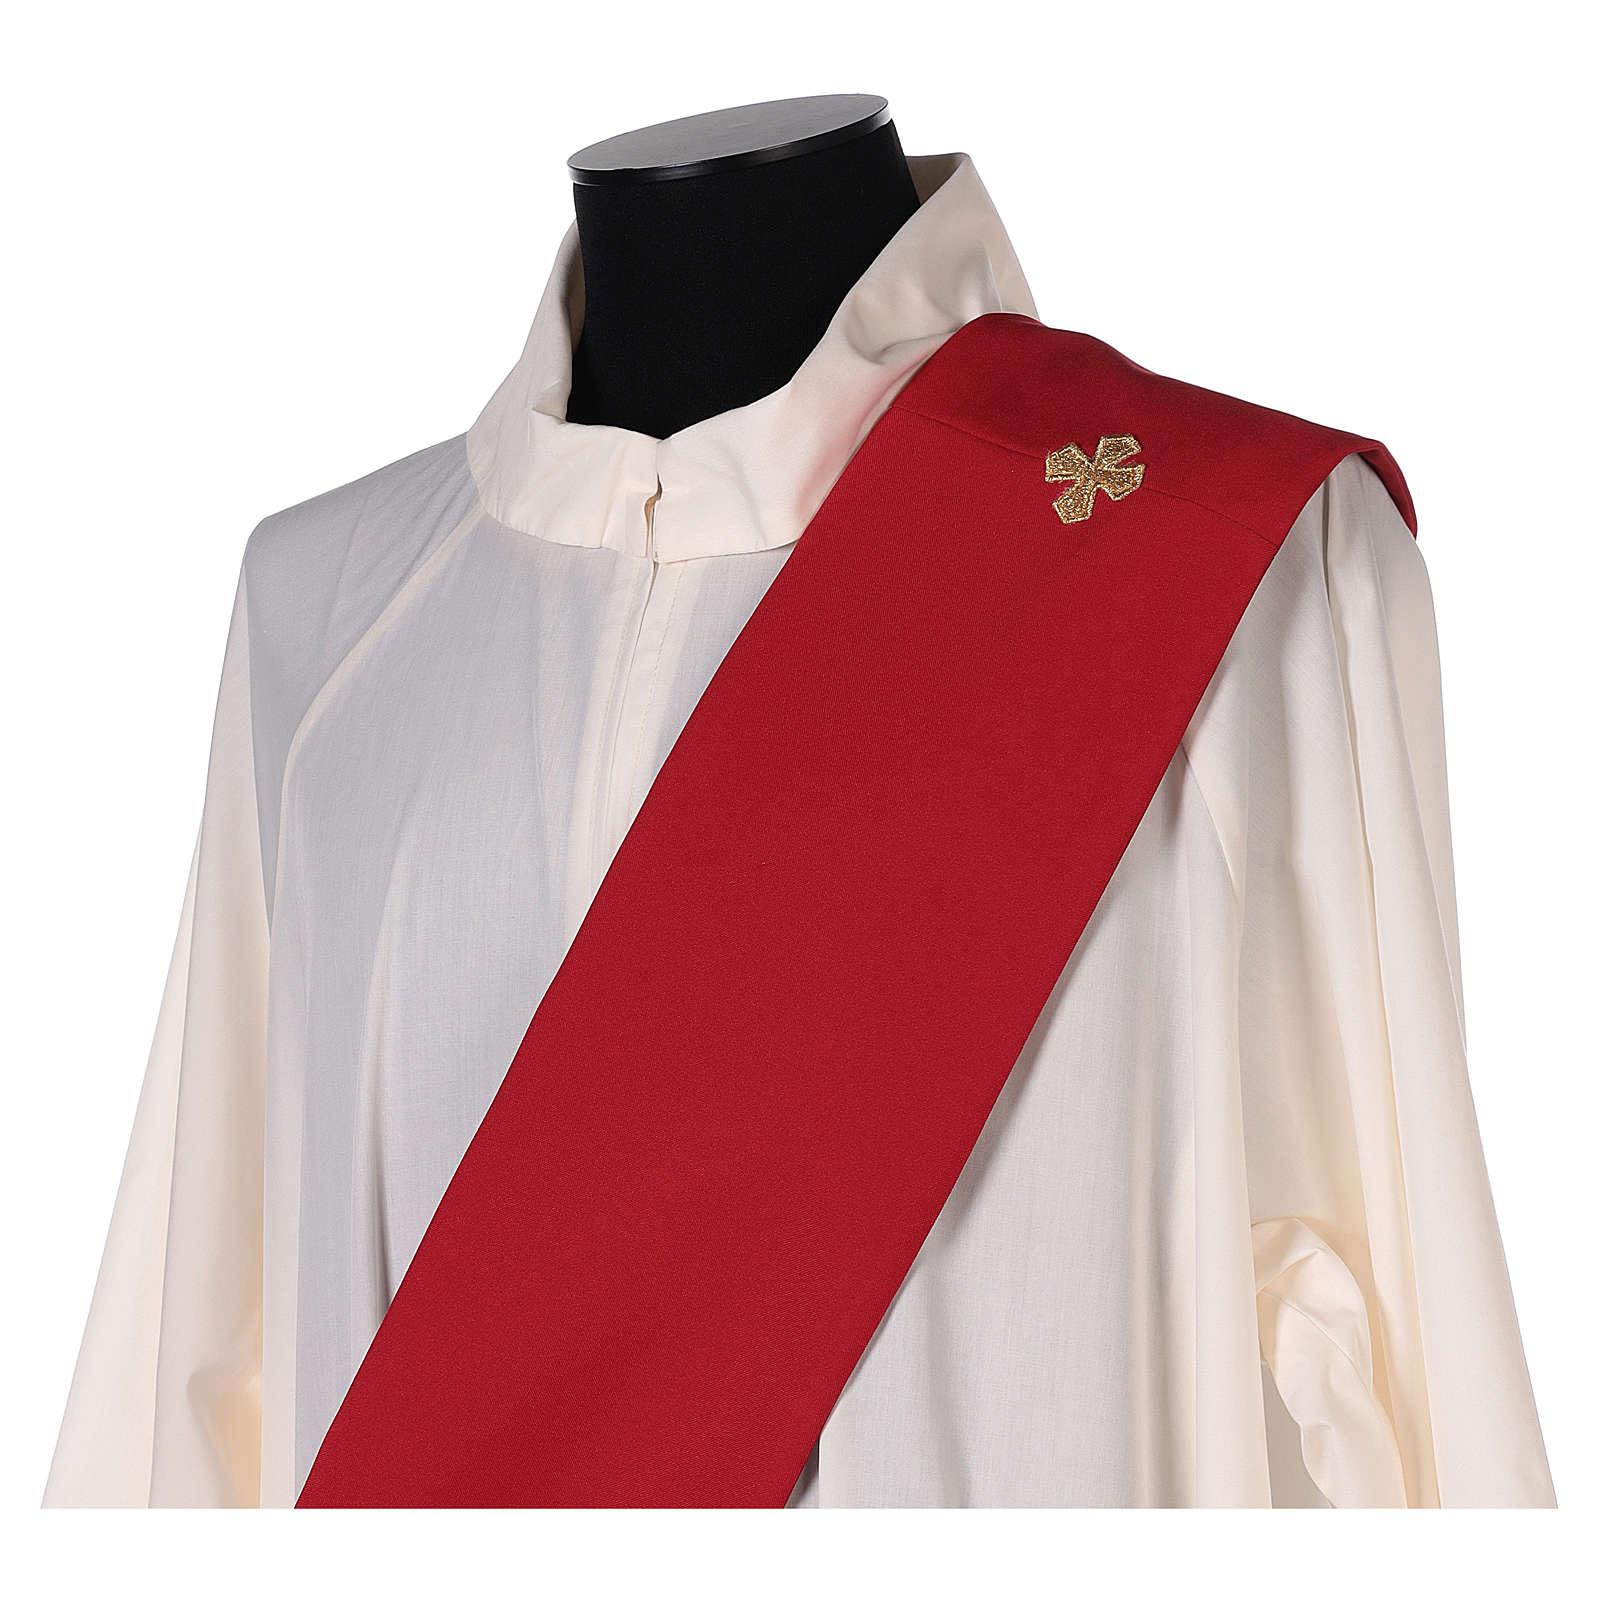 Stola diaconale ricamo croce JHS fronte retro tessuto Vatican 4